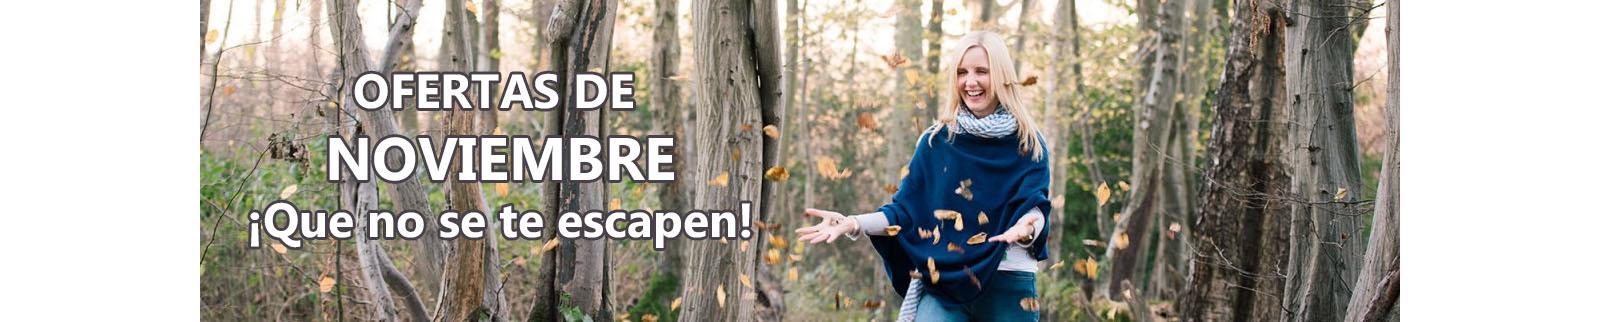 ofertas noviembre-la-herboristeria-online